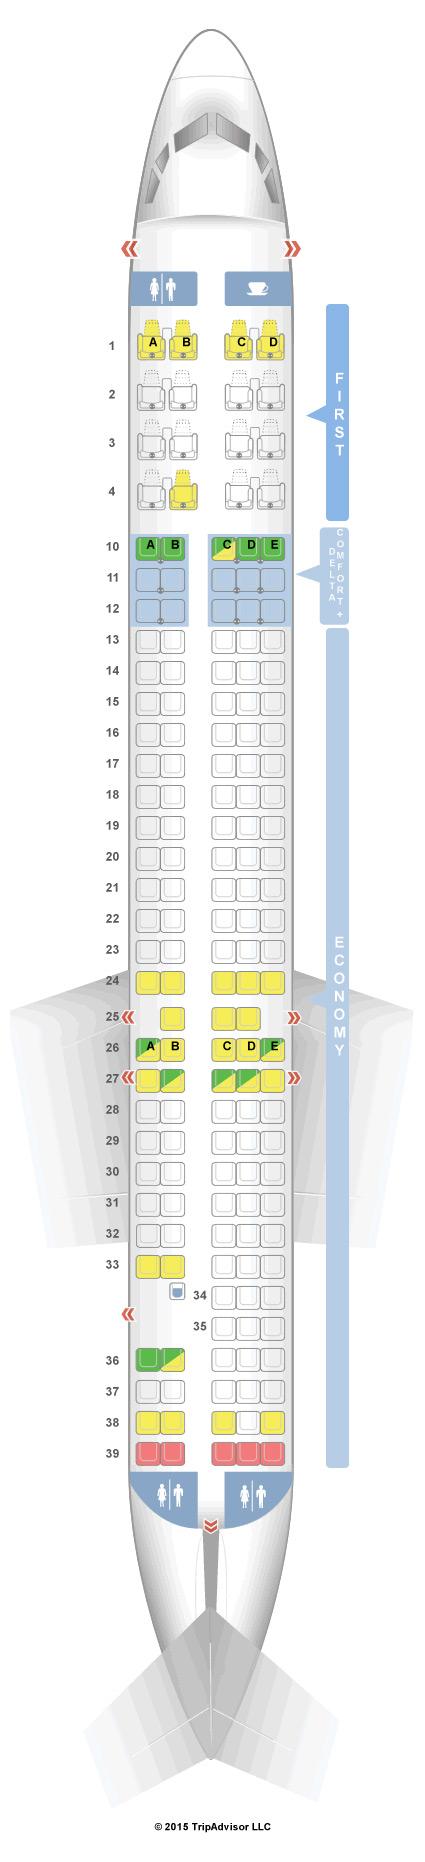 Seatguru Seat Map Delta Mcdonnell Douglas Md 90 Seatguru Delta Delta Airlines